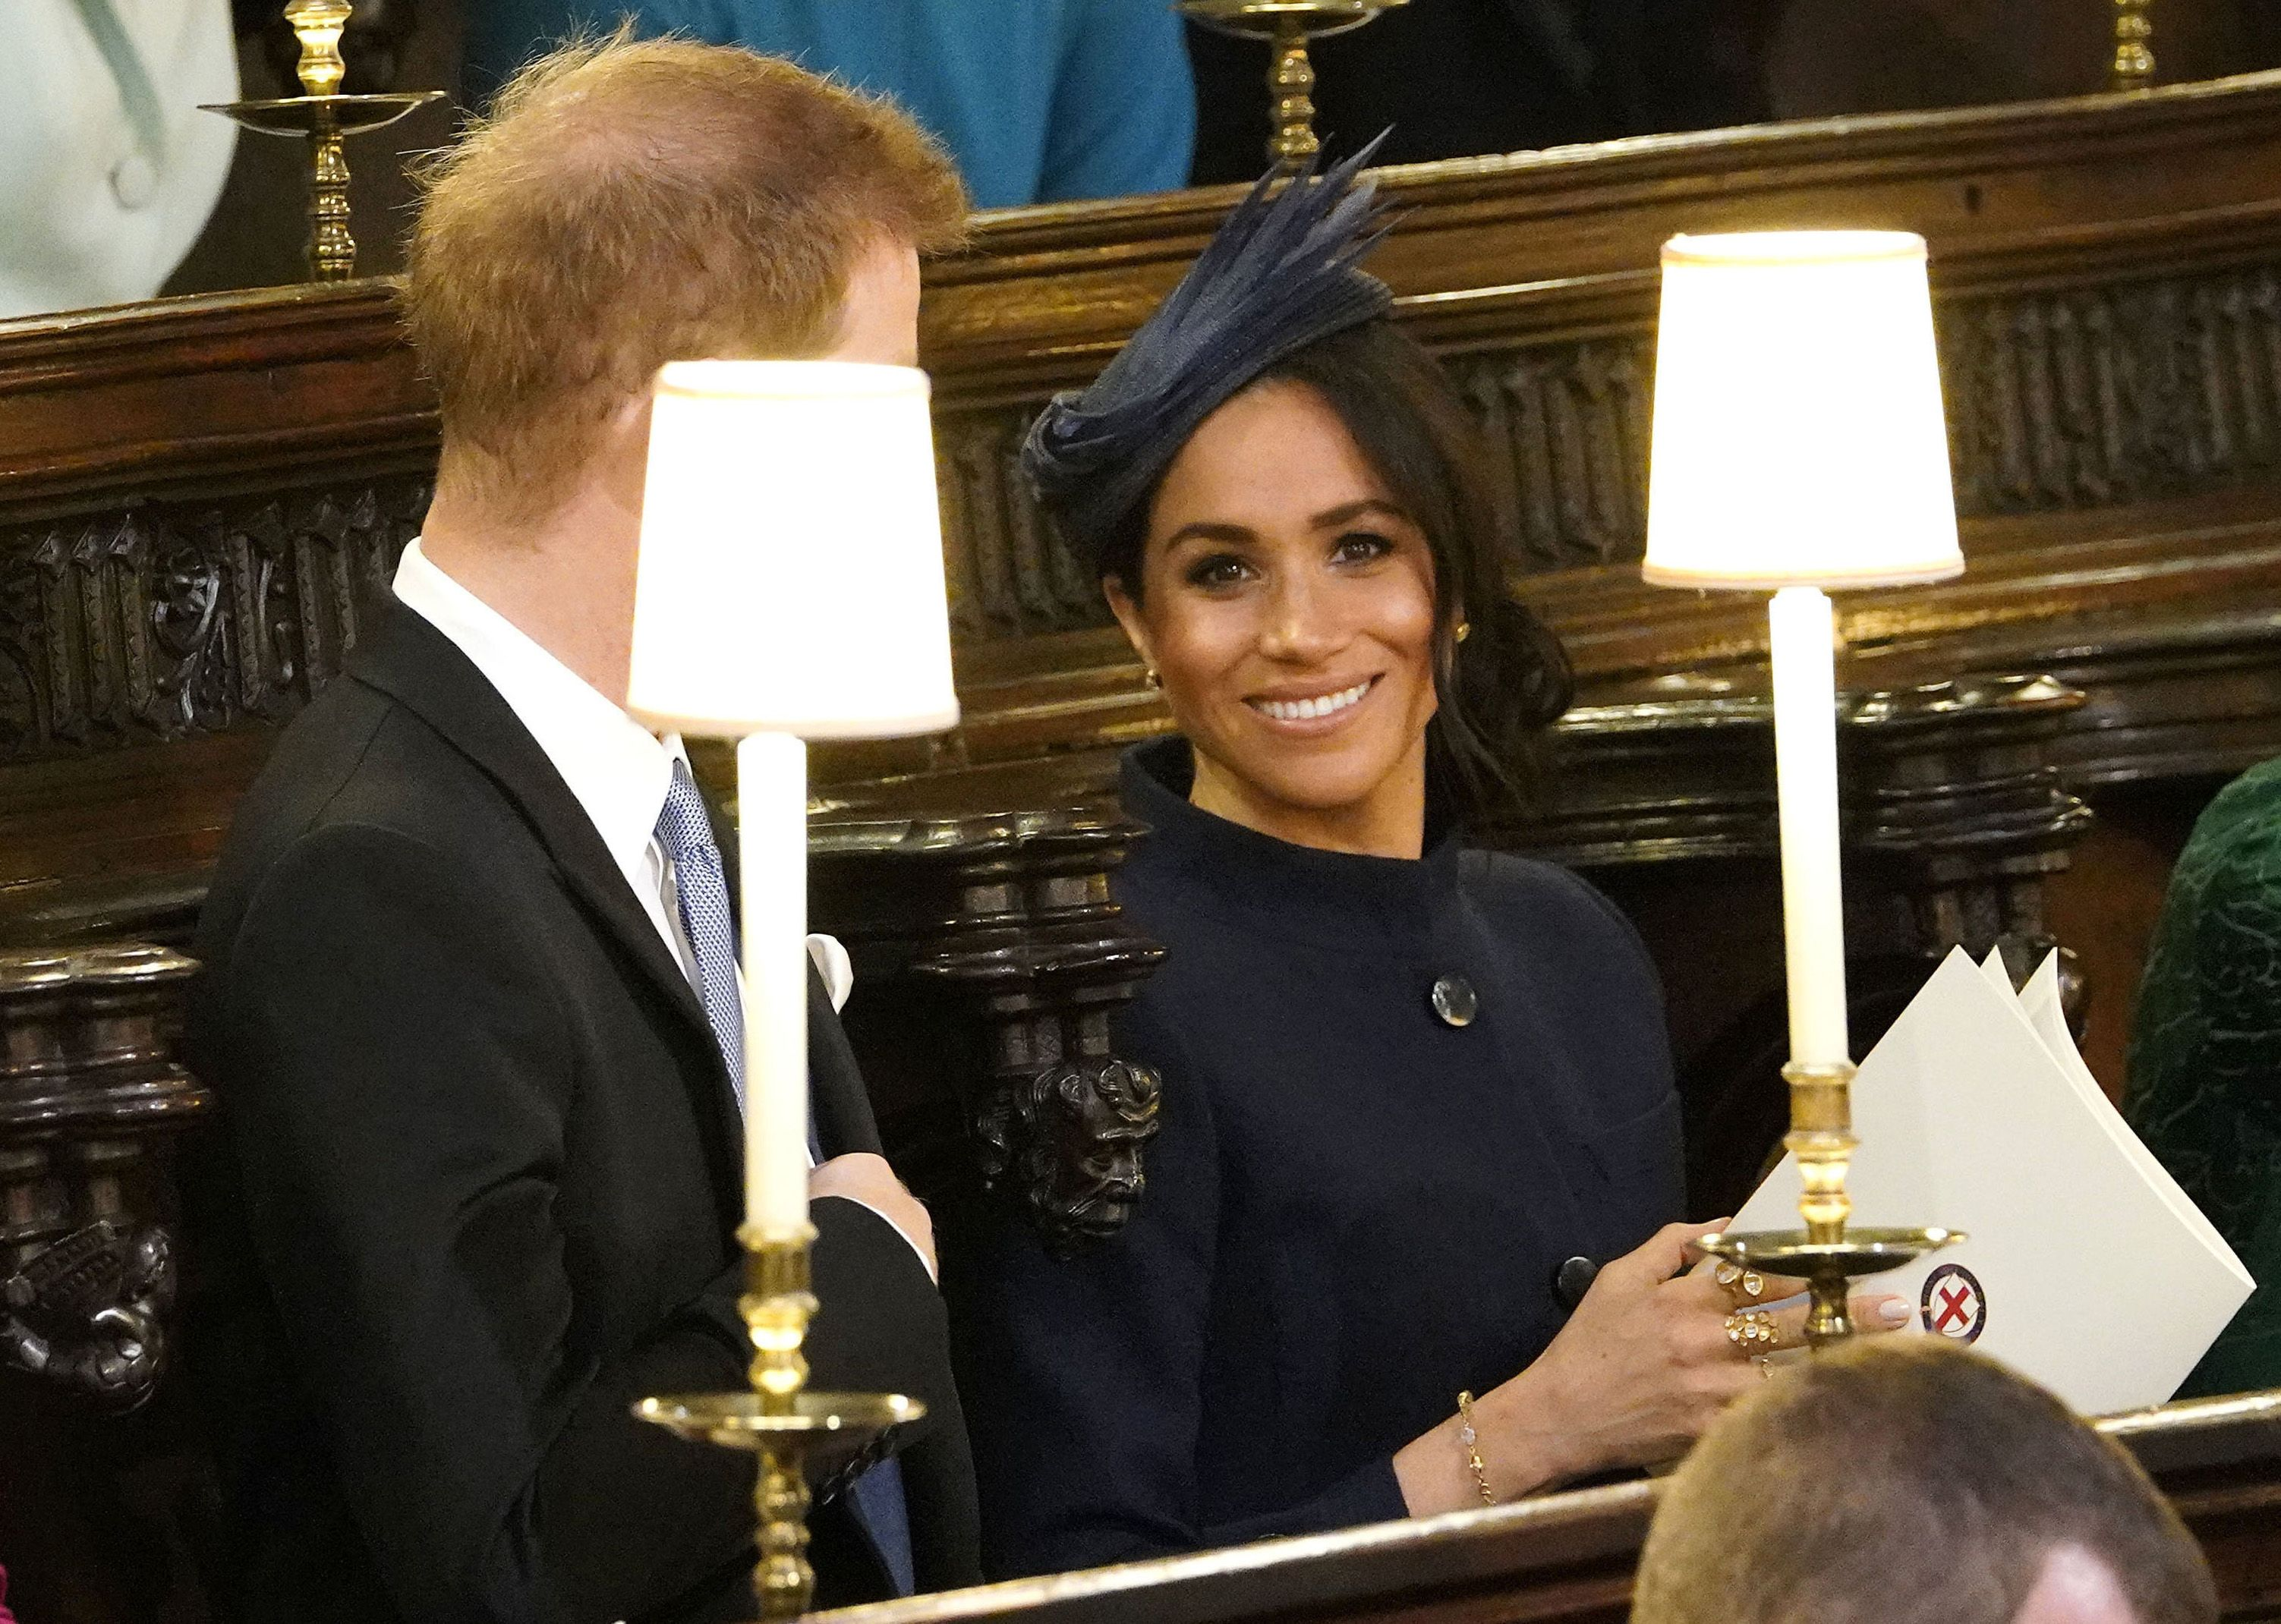 meghan markle at princess eugenie's royal wedding - photos